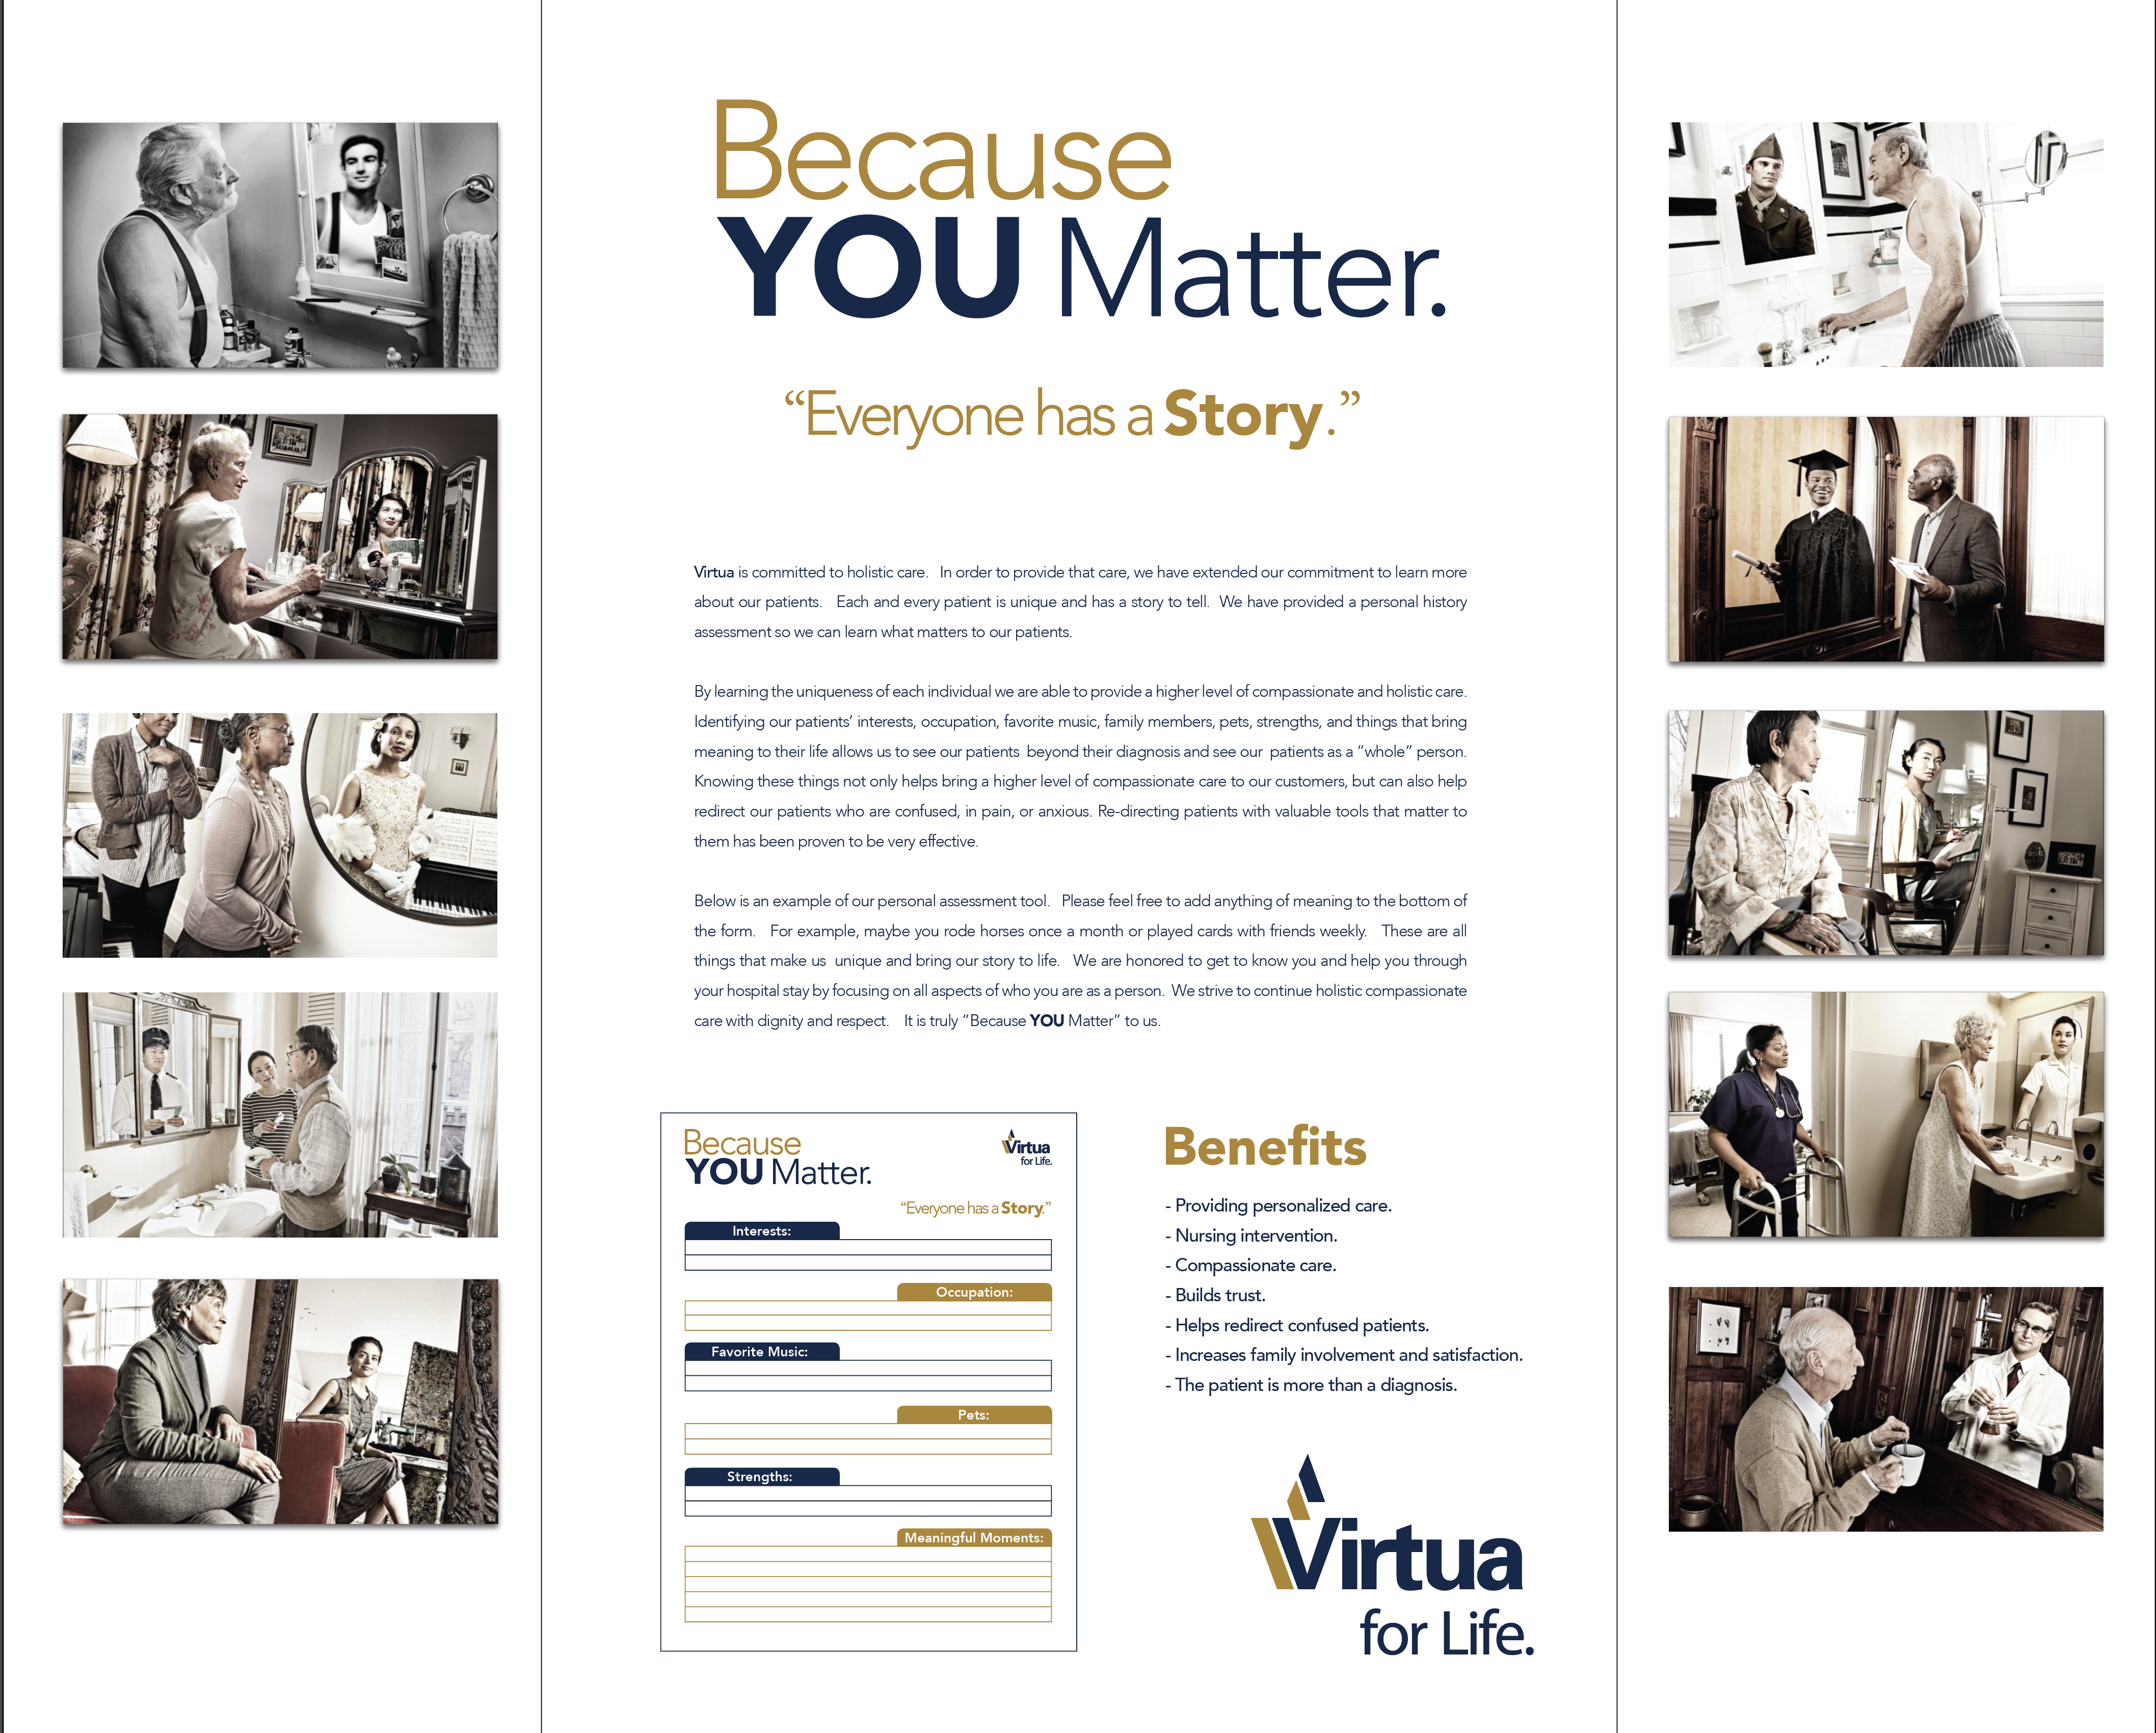 Virtua-Because-You-Matter-Campaign